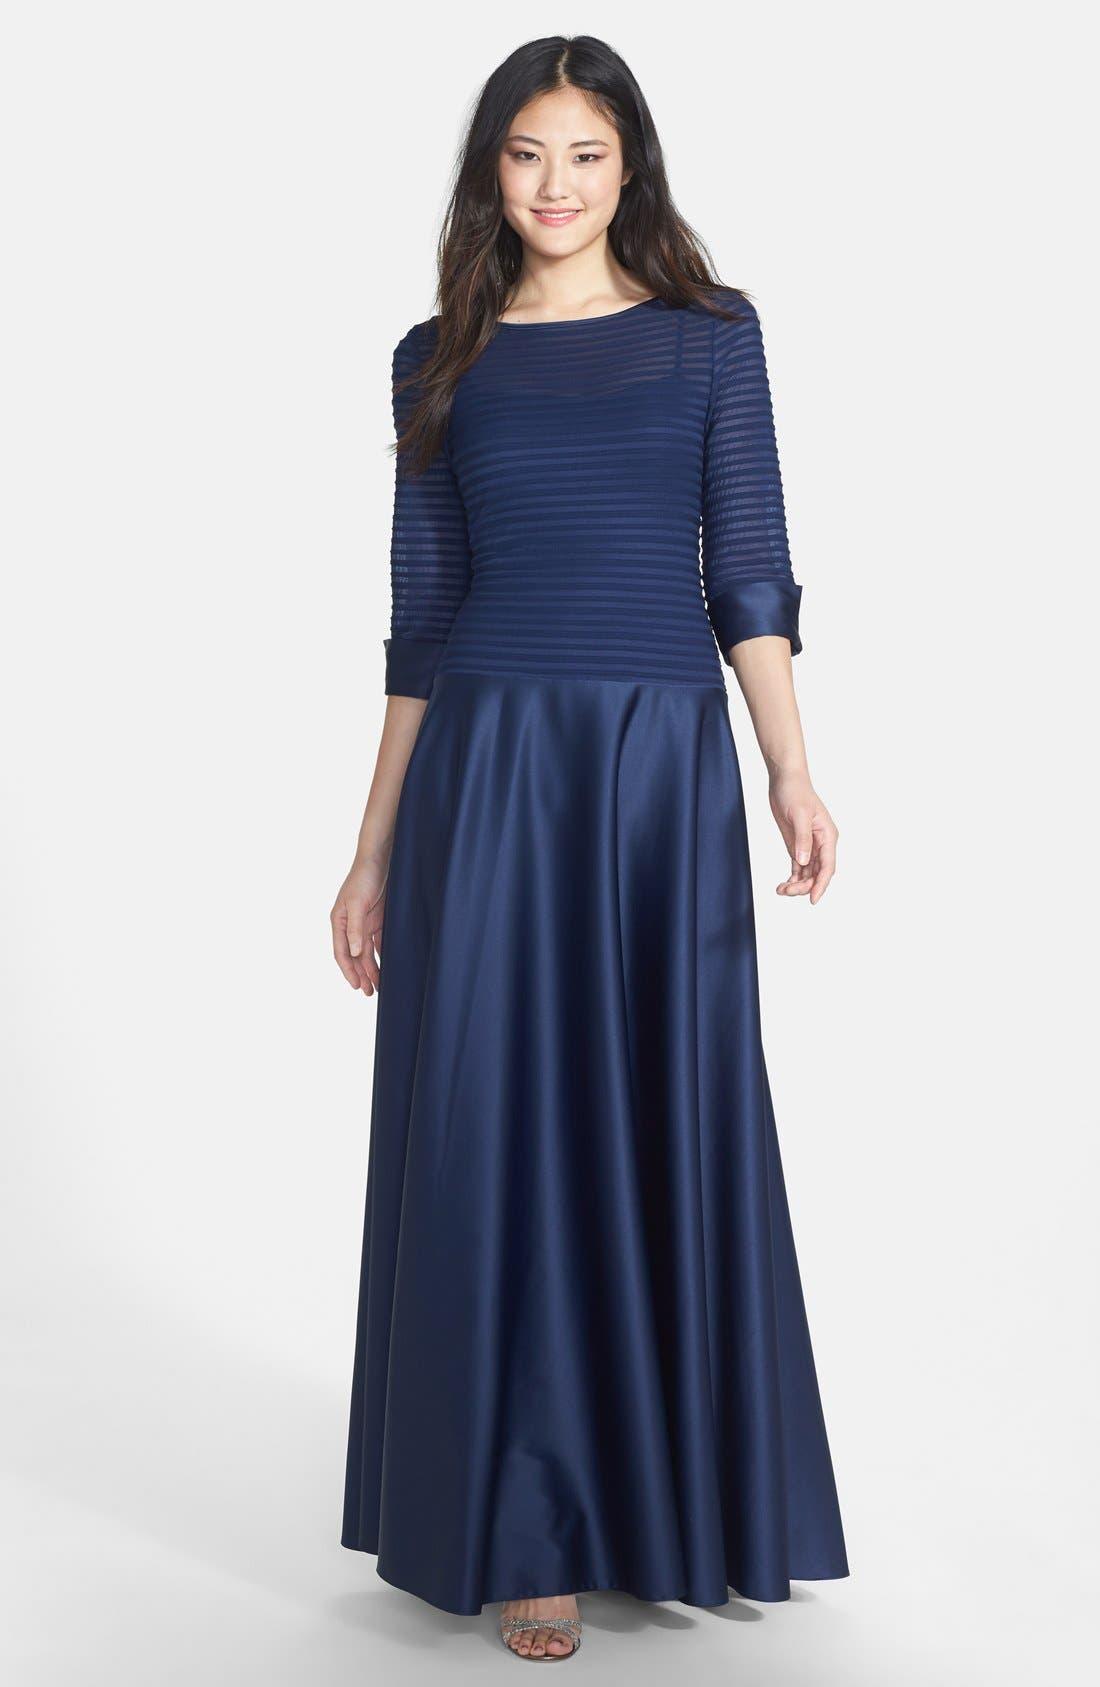 Alternate Image 1 Selected - JS Collections Illusion Bodice Dress (Regular & Petite)